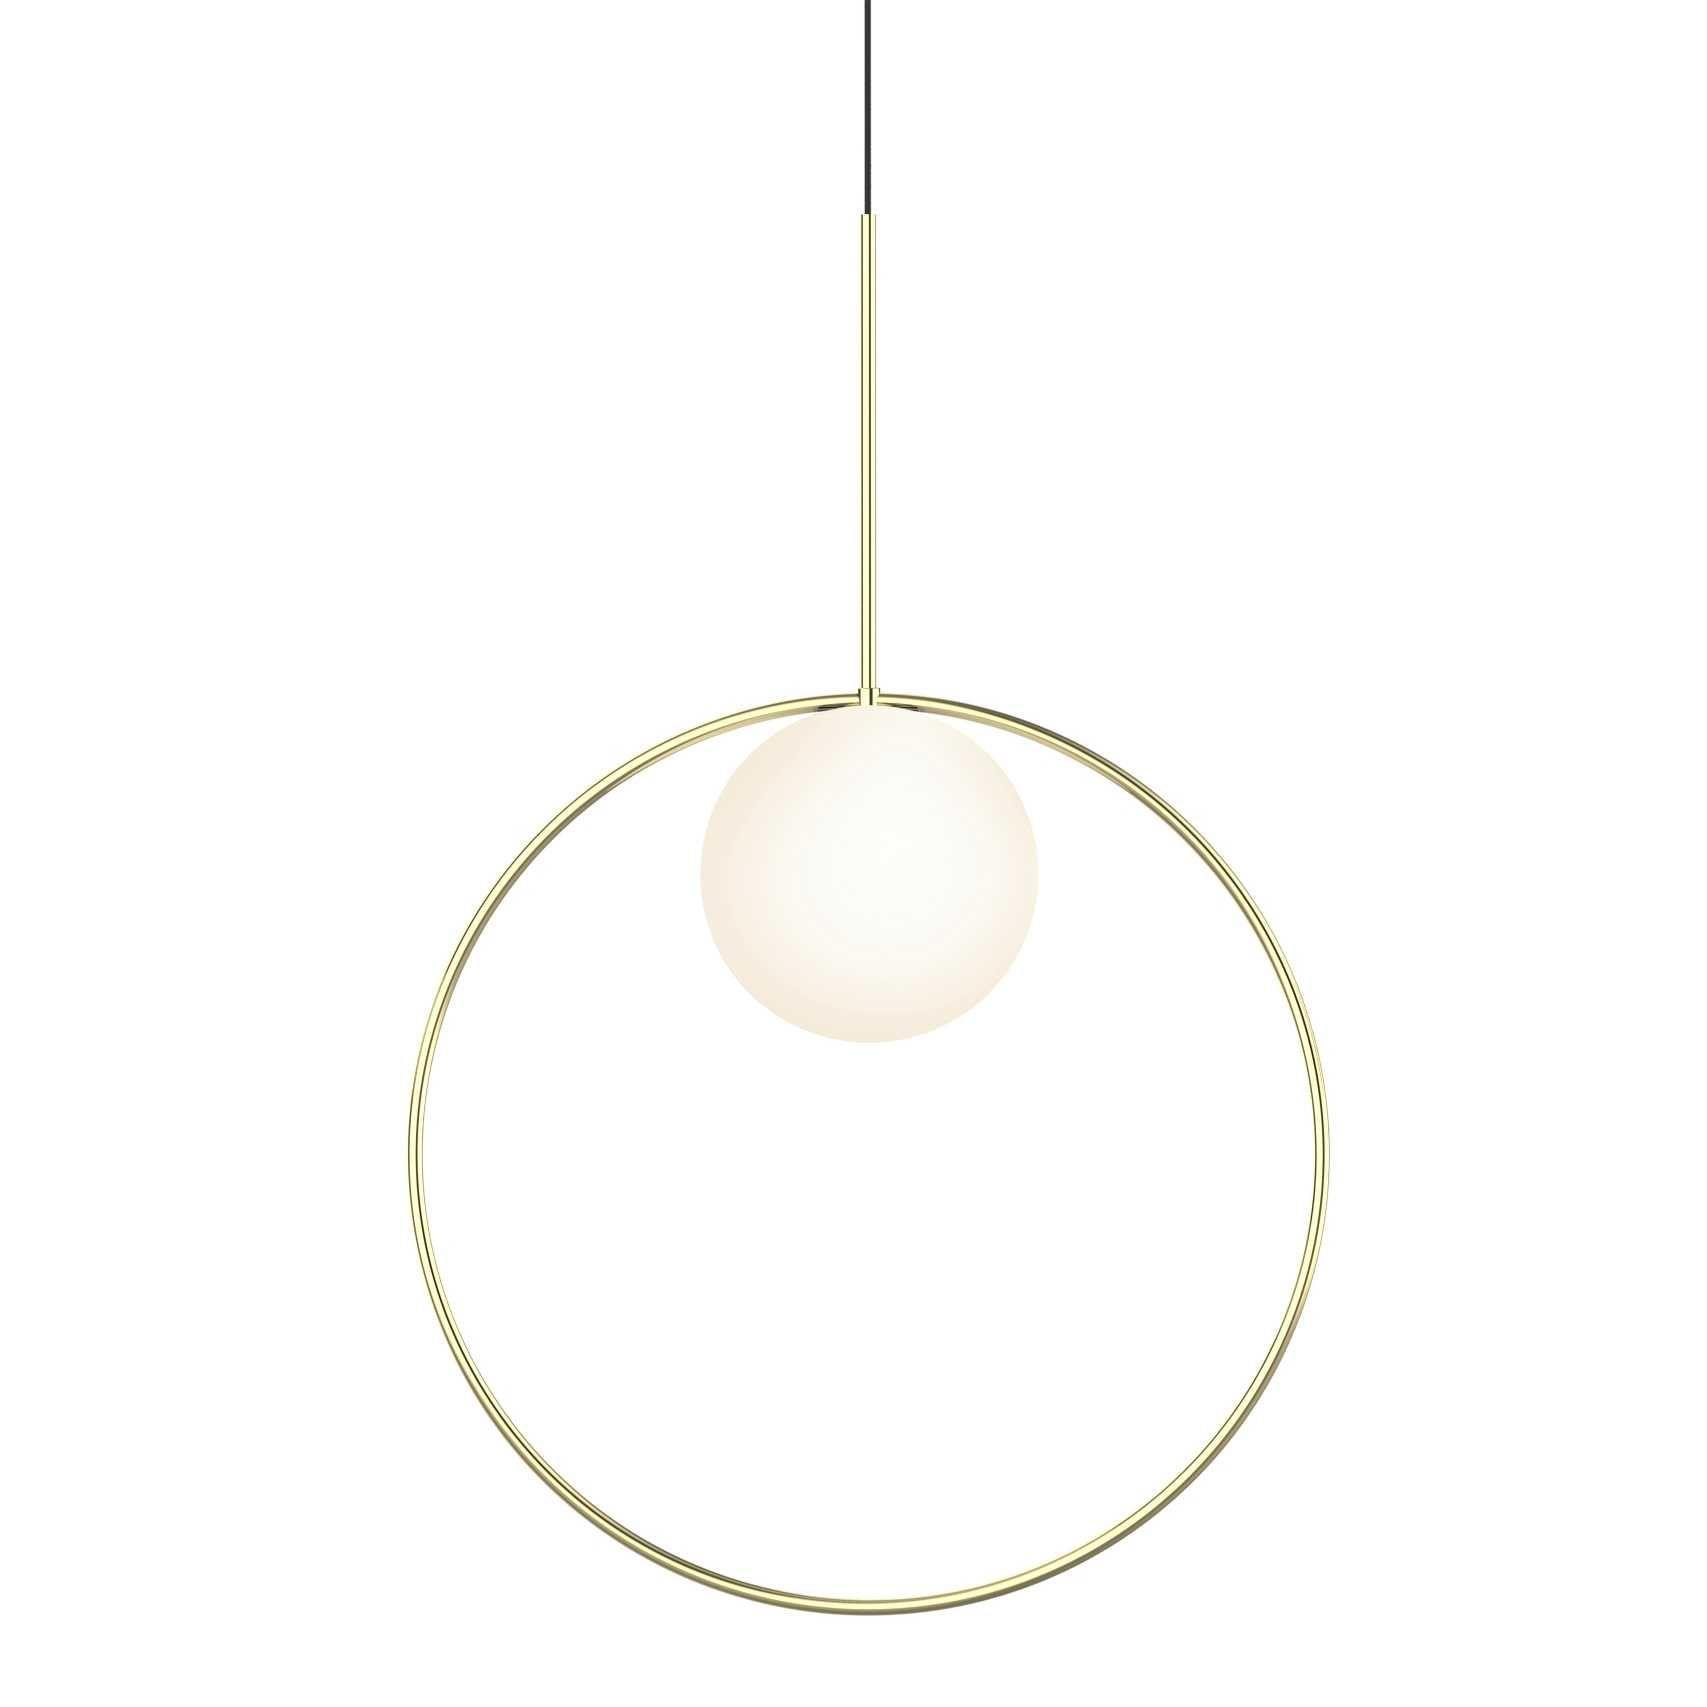 FonQ-Pablo Bola Halo 12 hanglamp LED messing-aanbieding